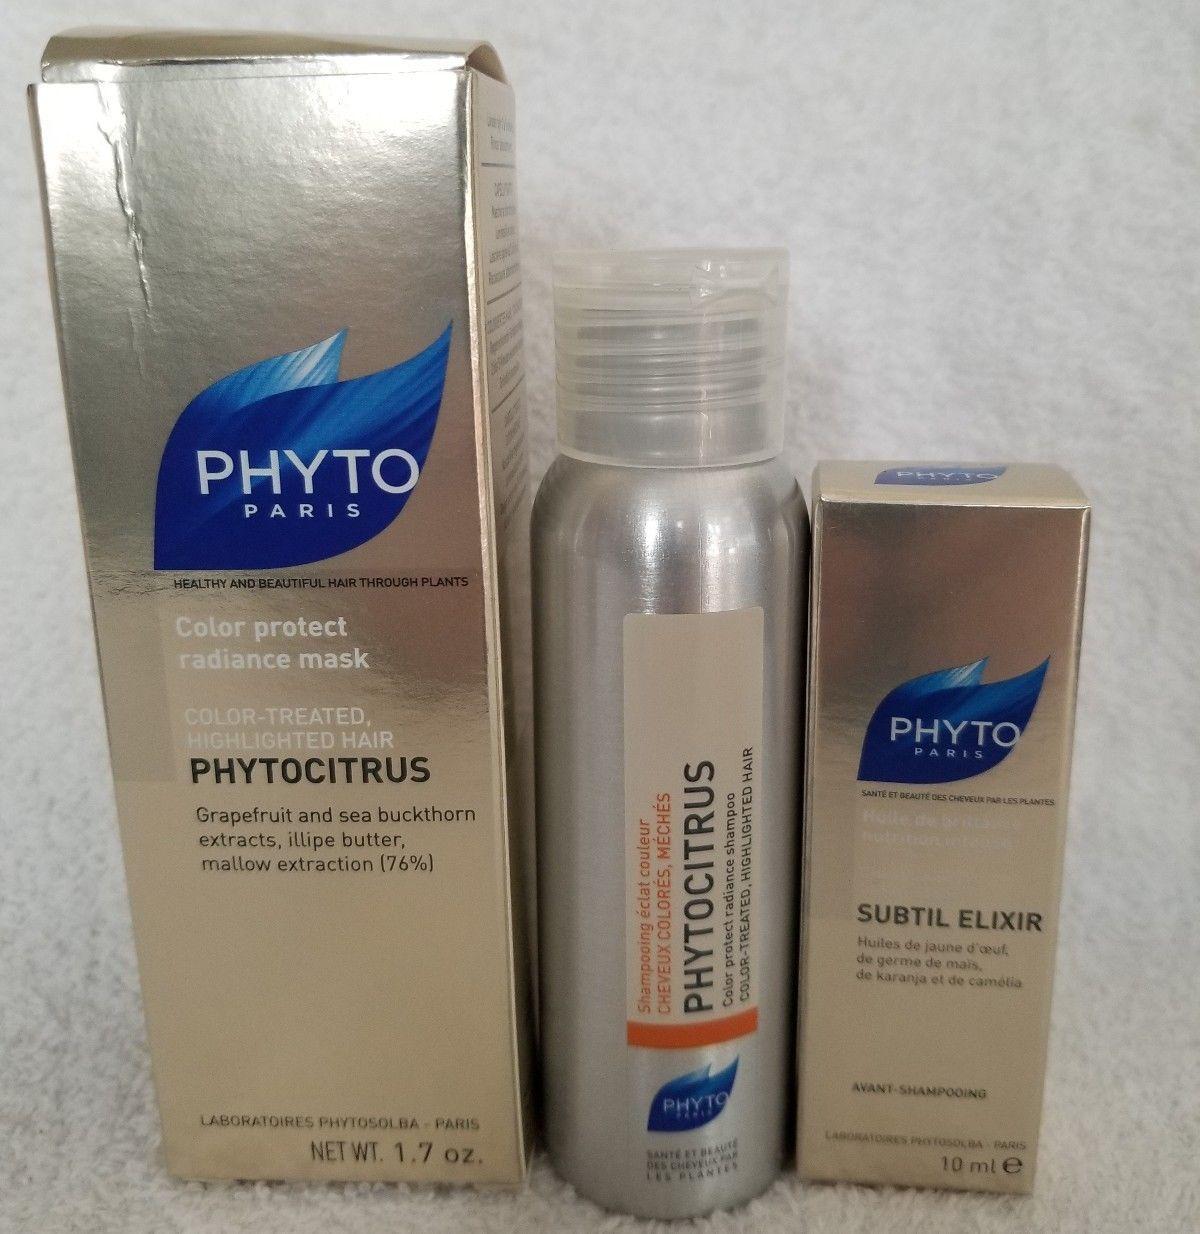 Phyto COLOR PROTECT 3Piece Travel Set PhytoCitrus Shampoo Mask Subtil Elixir New